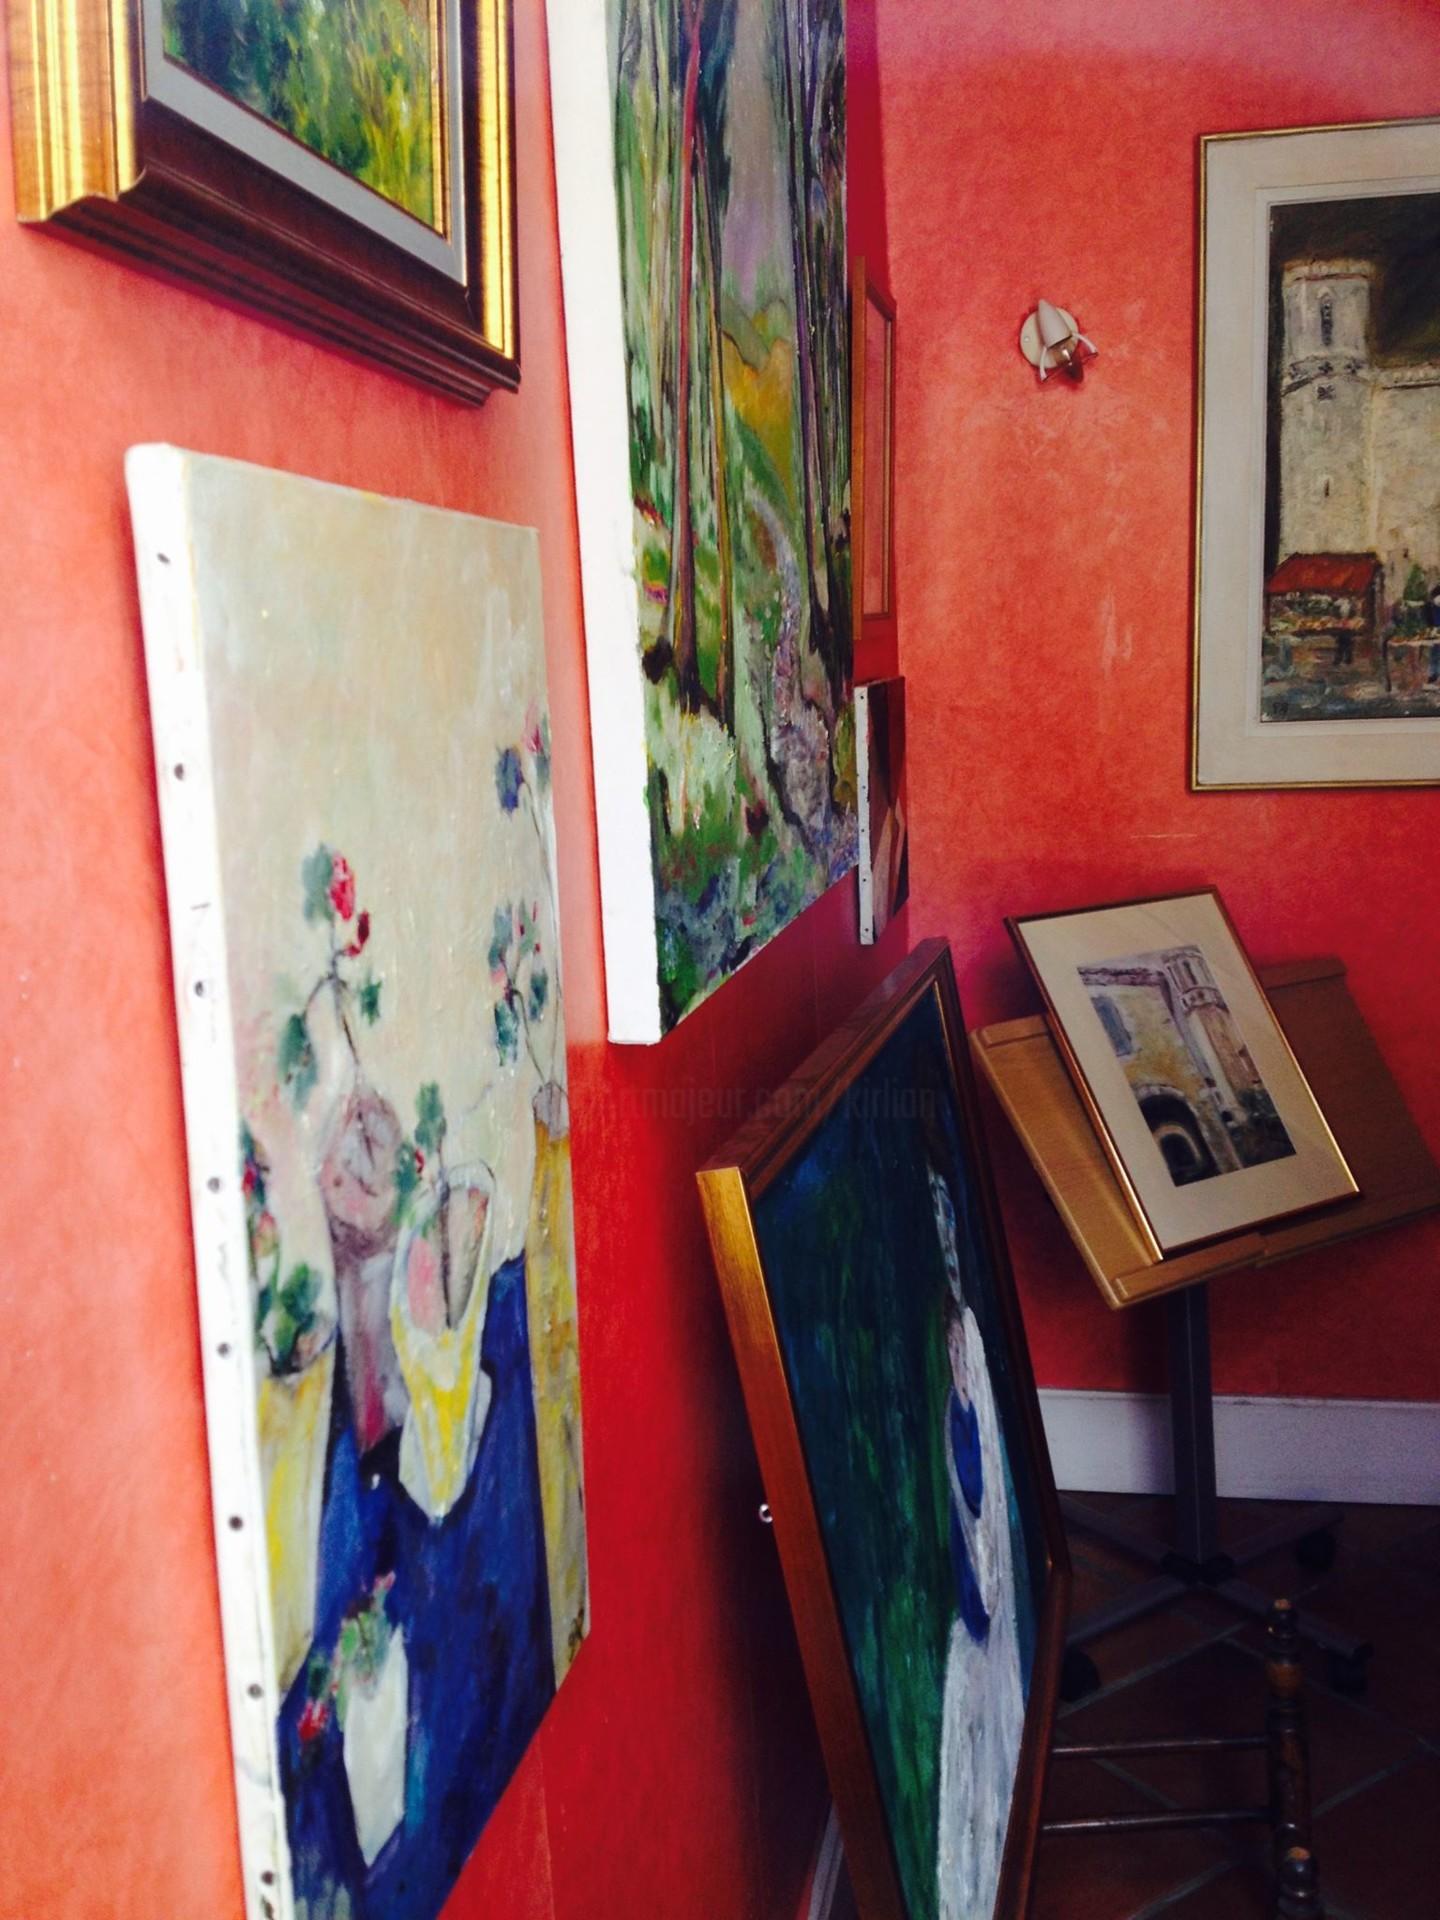 Kirlian - Atelier d'Artiste, Valence-sur-Baïse (Gers)